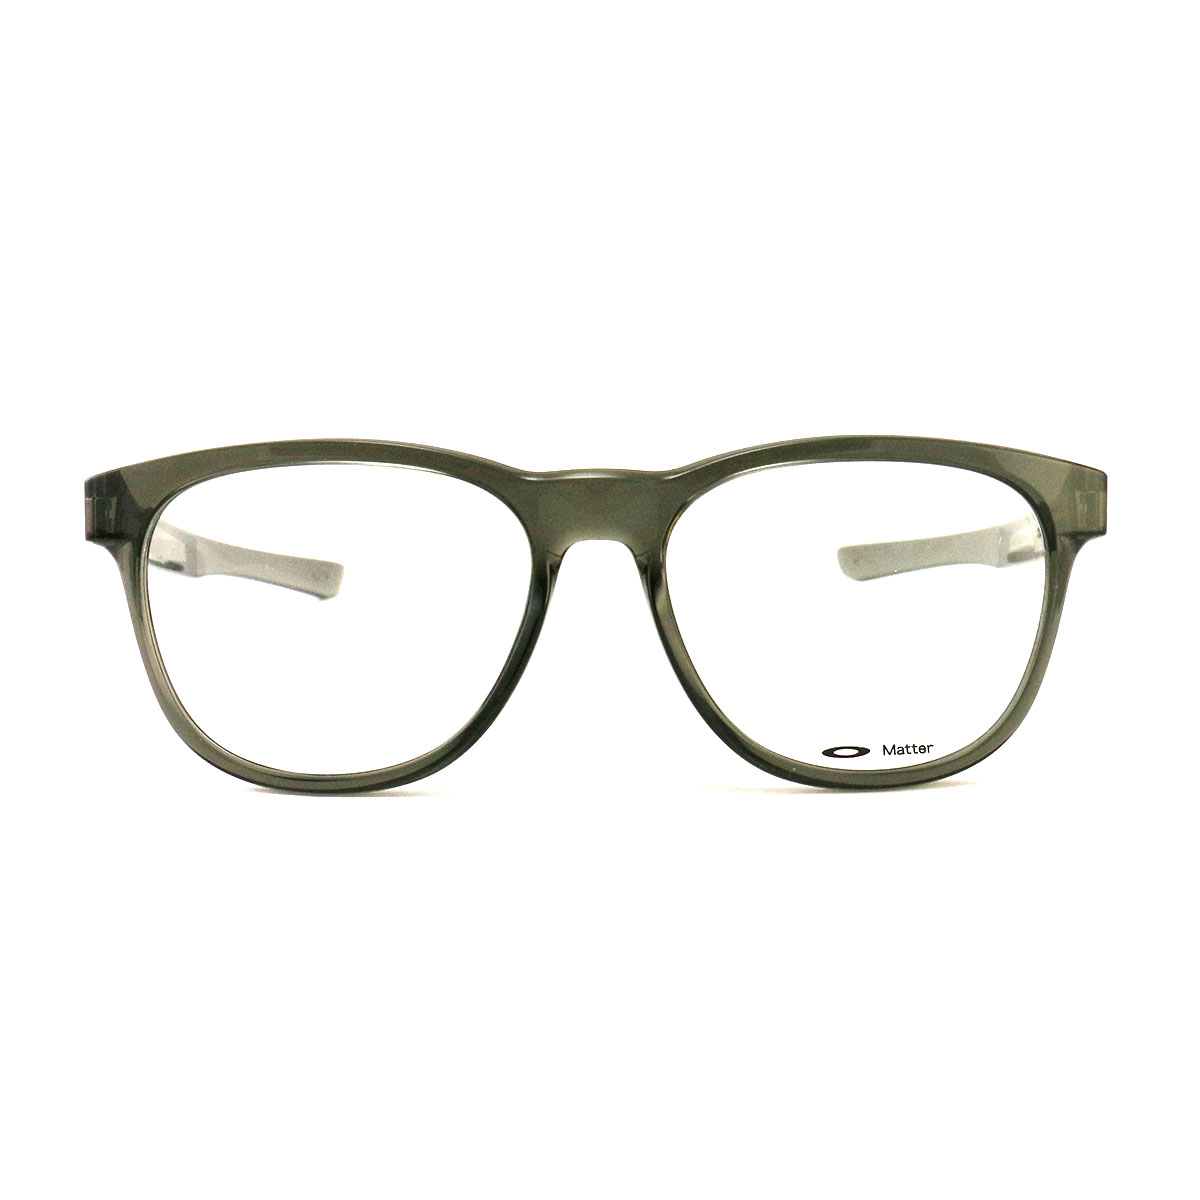 849f2ea6a38 Oakley Stringer Clear Black Eyeglasses OX8088-04 Demo Lens 55 16 145 ...